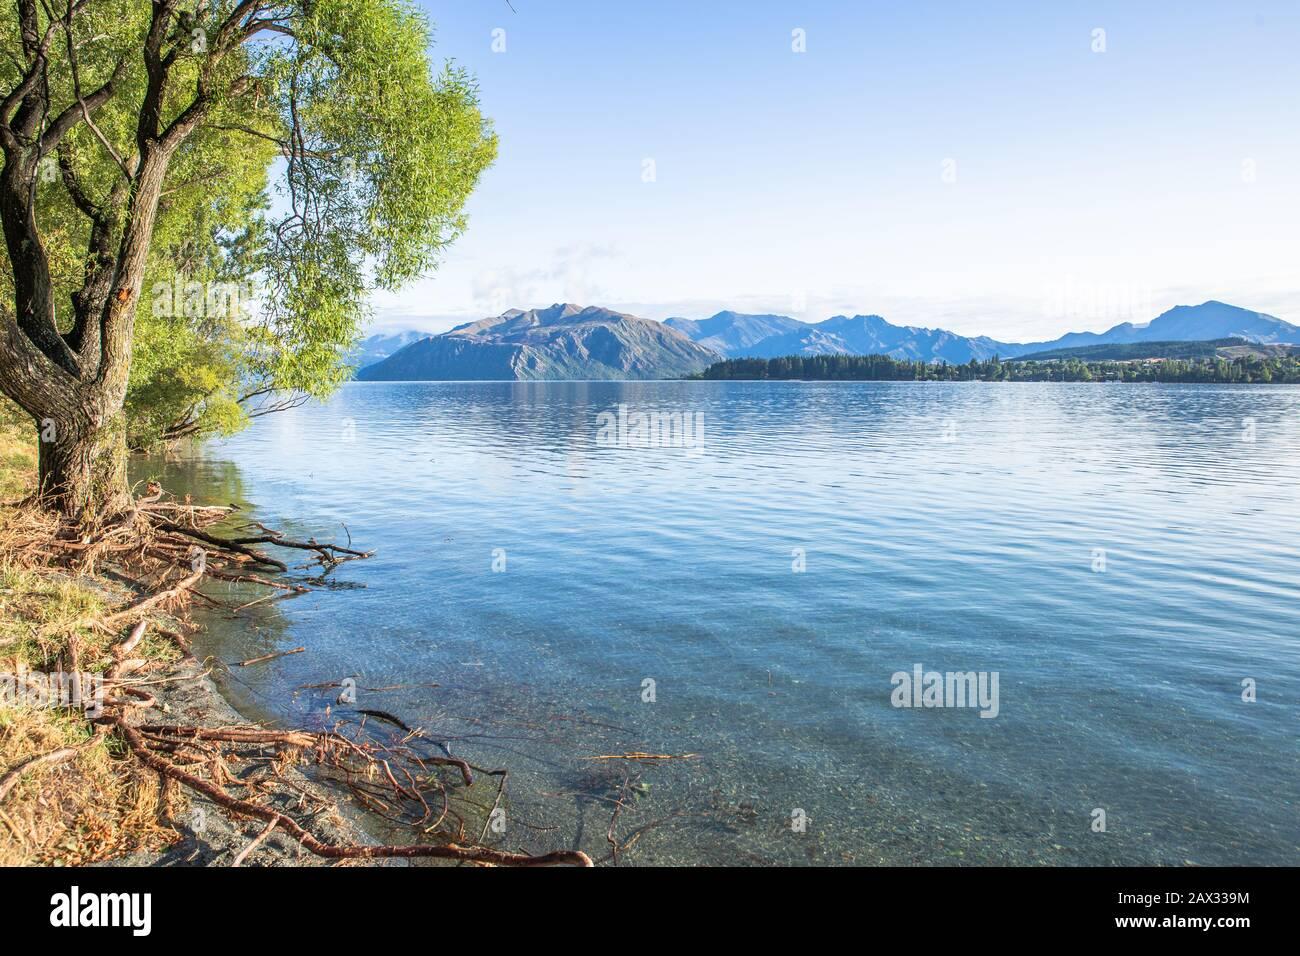 Early morning lake sunrise with golden light. Blue sky and water. Lake Wanaka New Zealand, Popular travel destination. Stock Photo